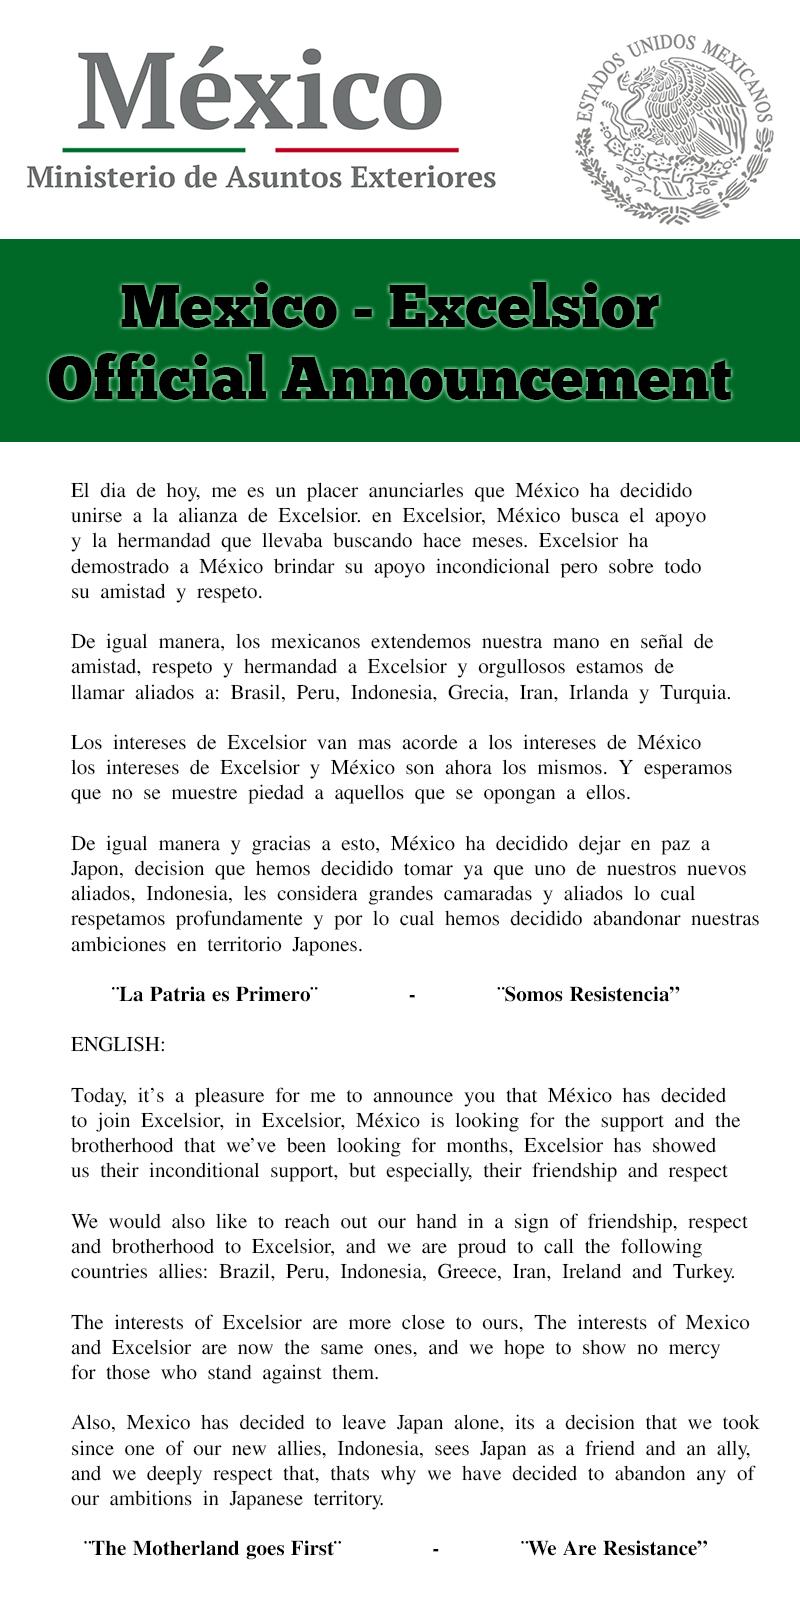 https://i.ibb.co/5LfvYtq/Mexico-se-une-a-excelsior.jpg